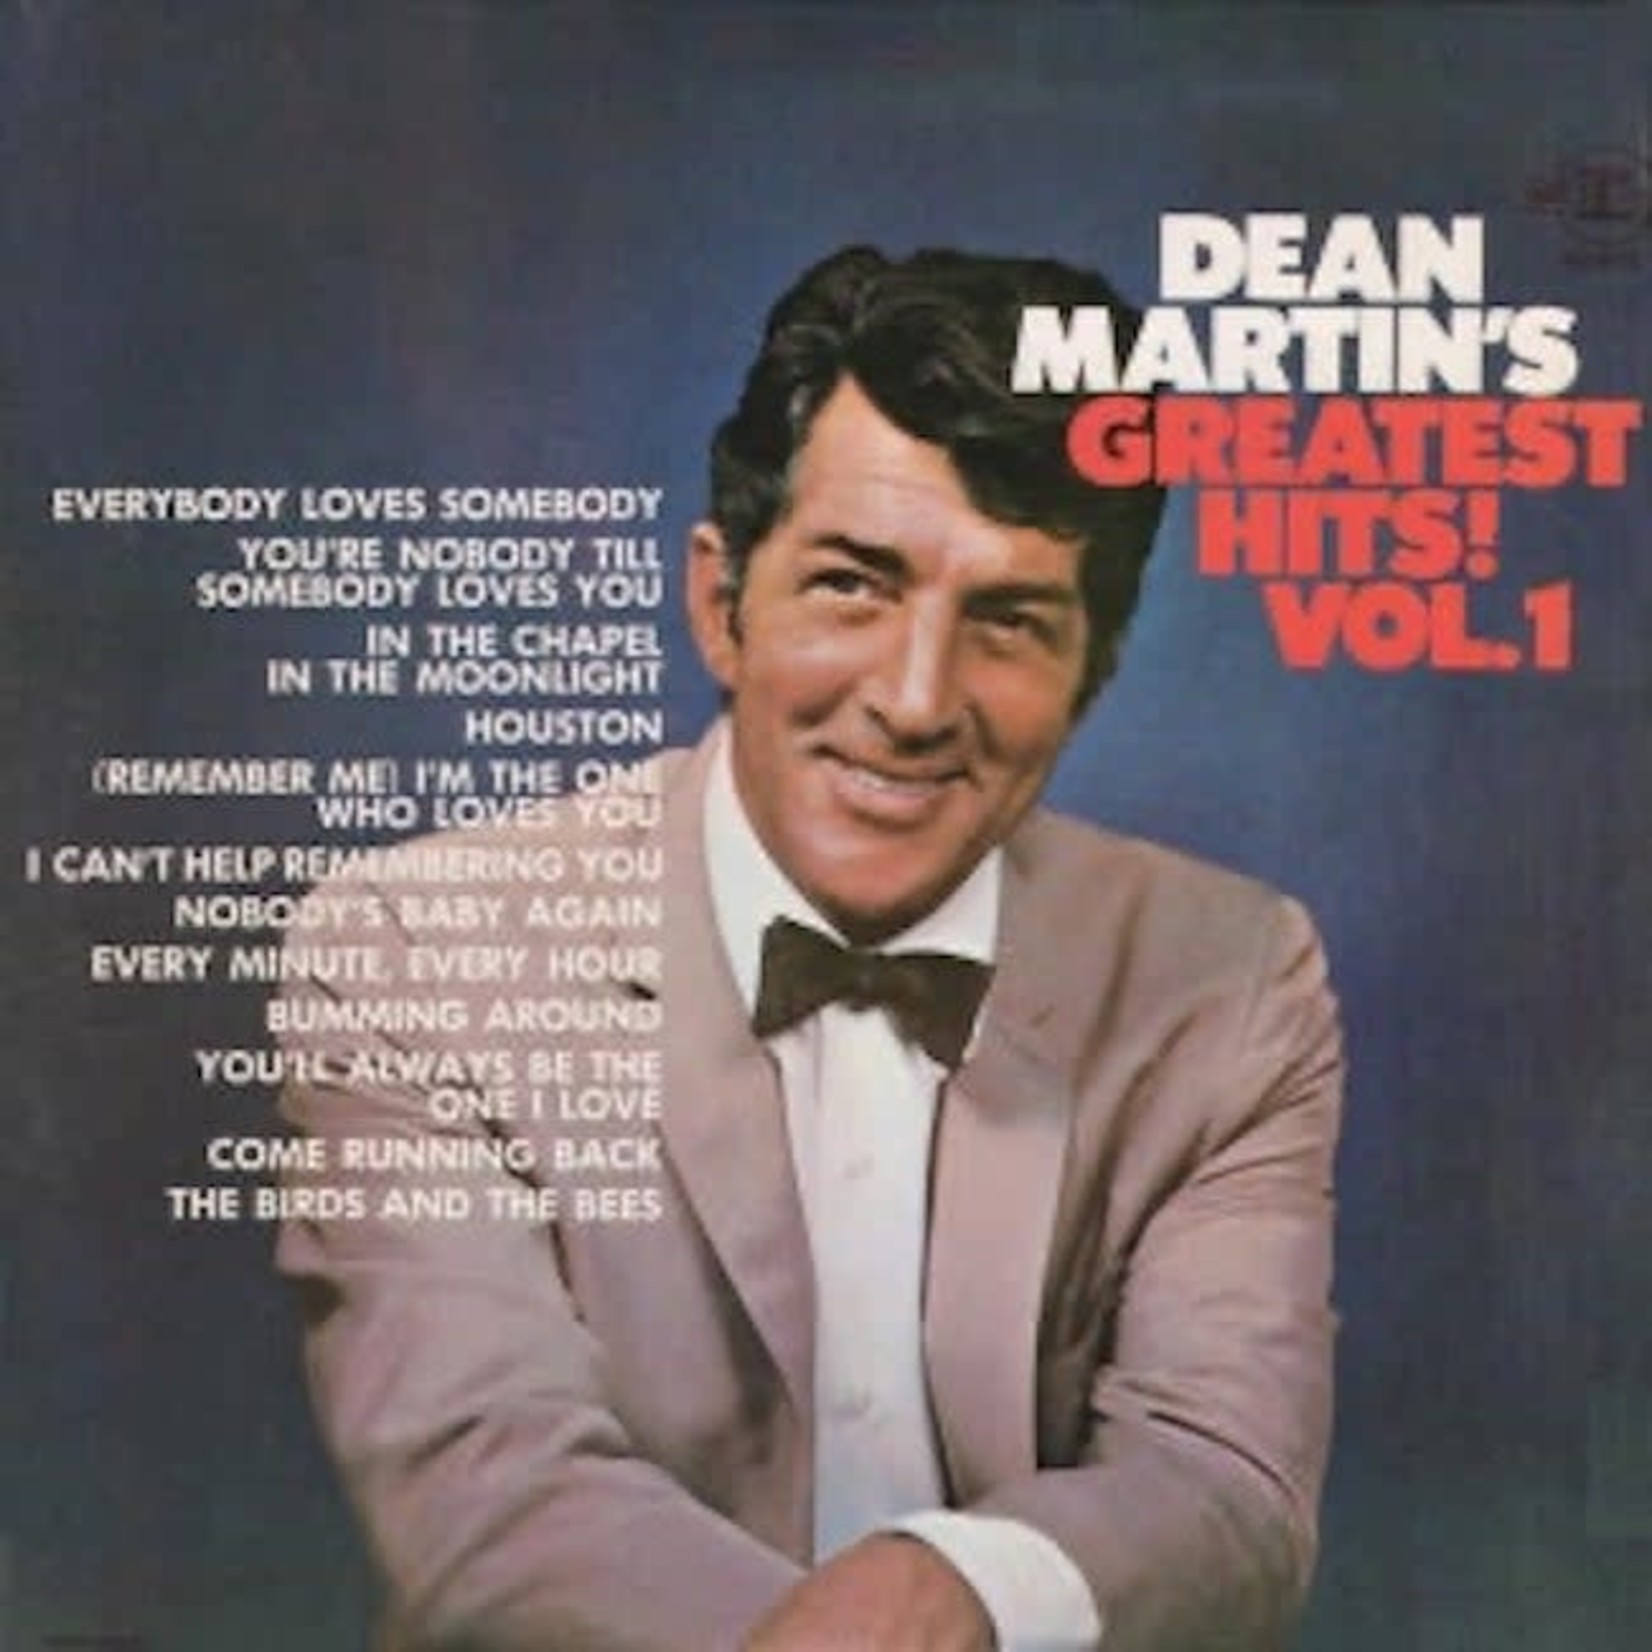 [Vintage] Martin, Dean: Greatest Hits Vol. 1